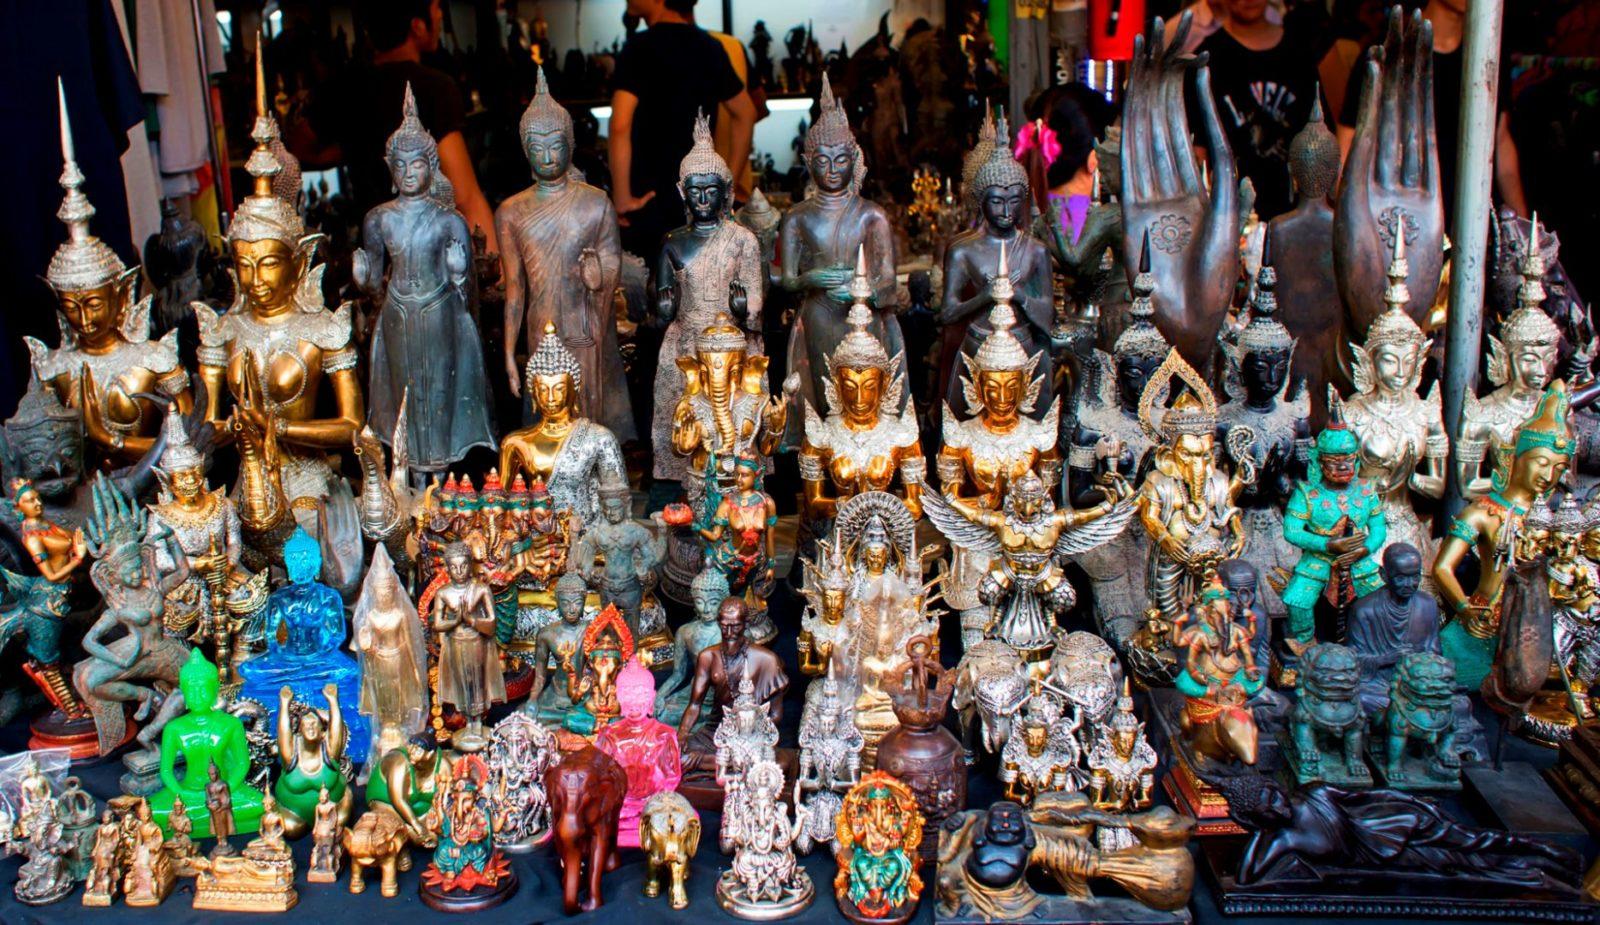 Популярные сувениры из Тайланда